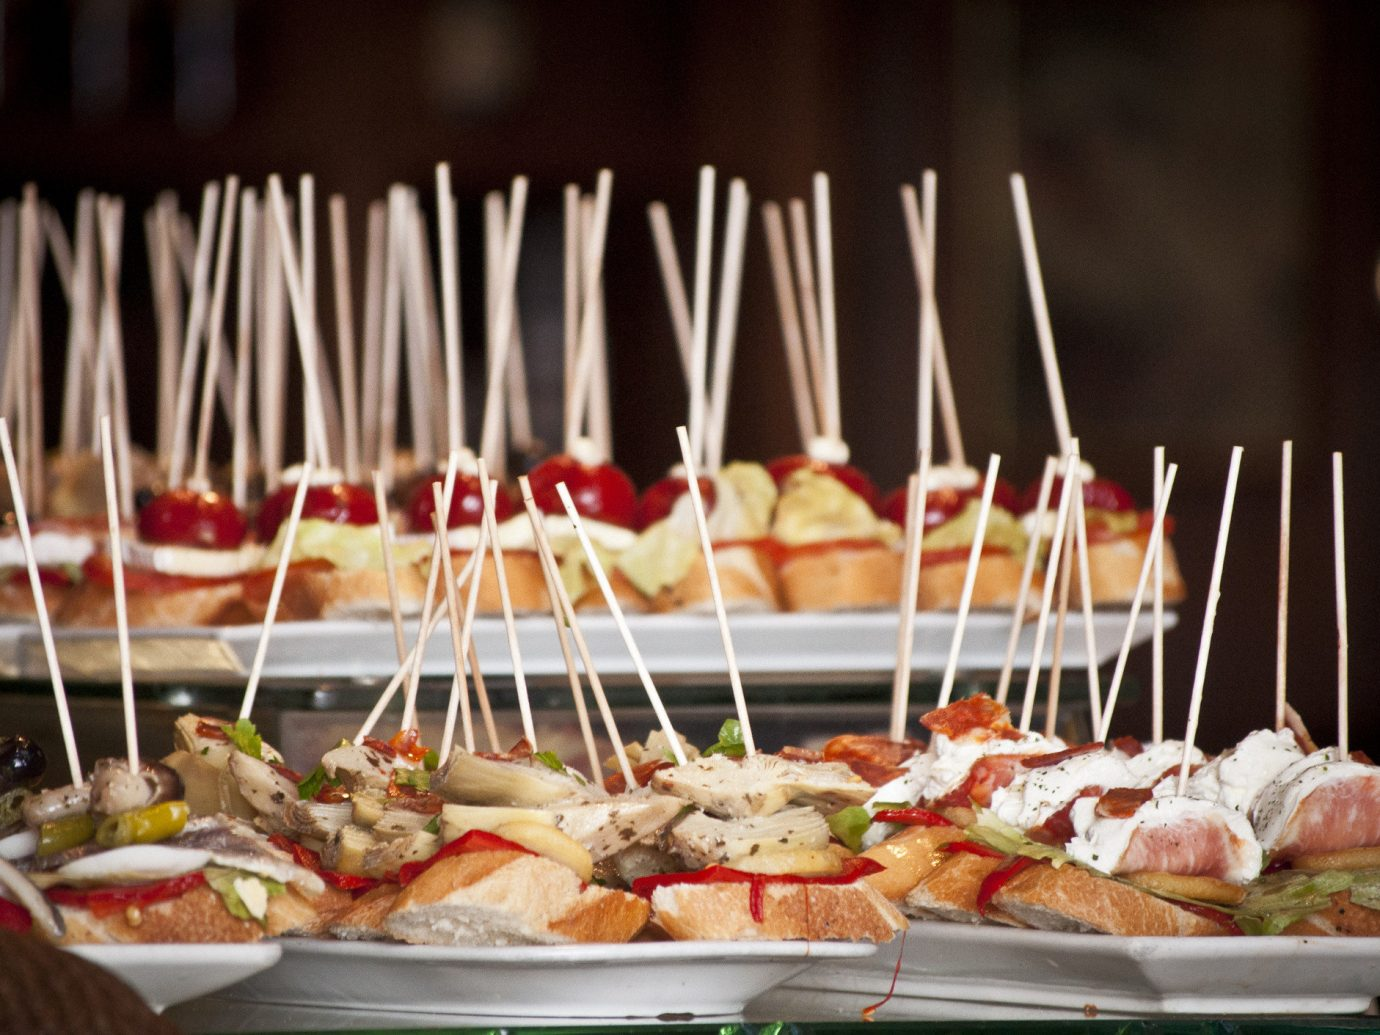 Trip Ideas plate food table meal buffet dish brunch sense cuisine pincho restaurant